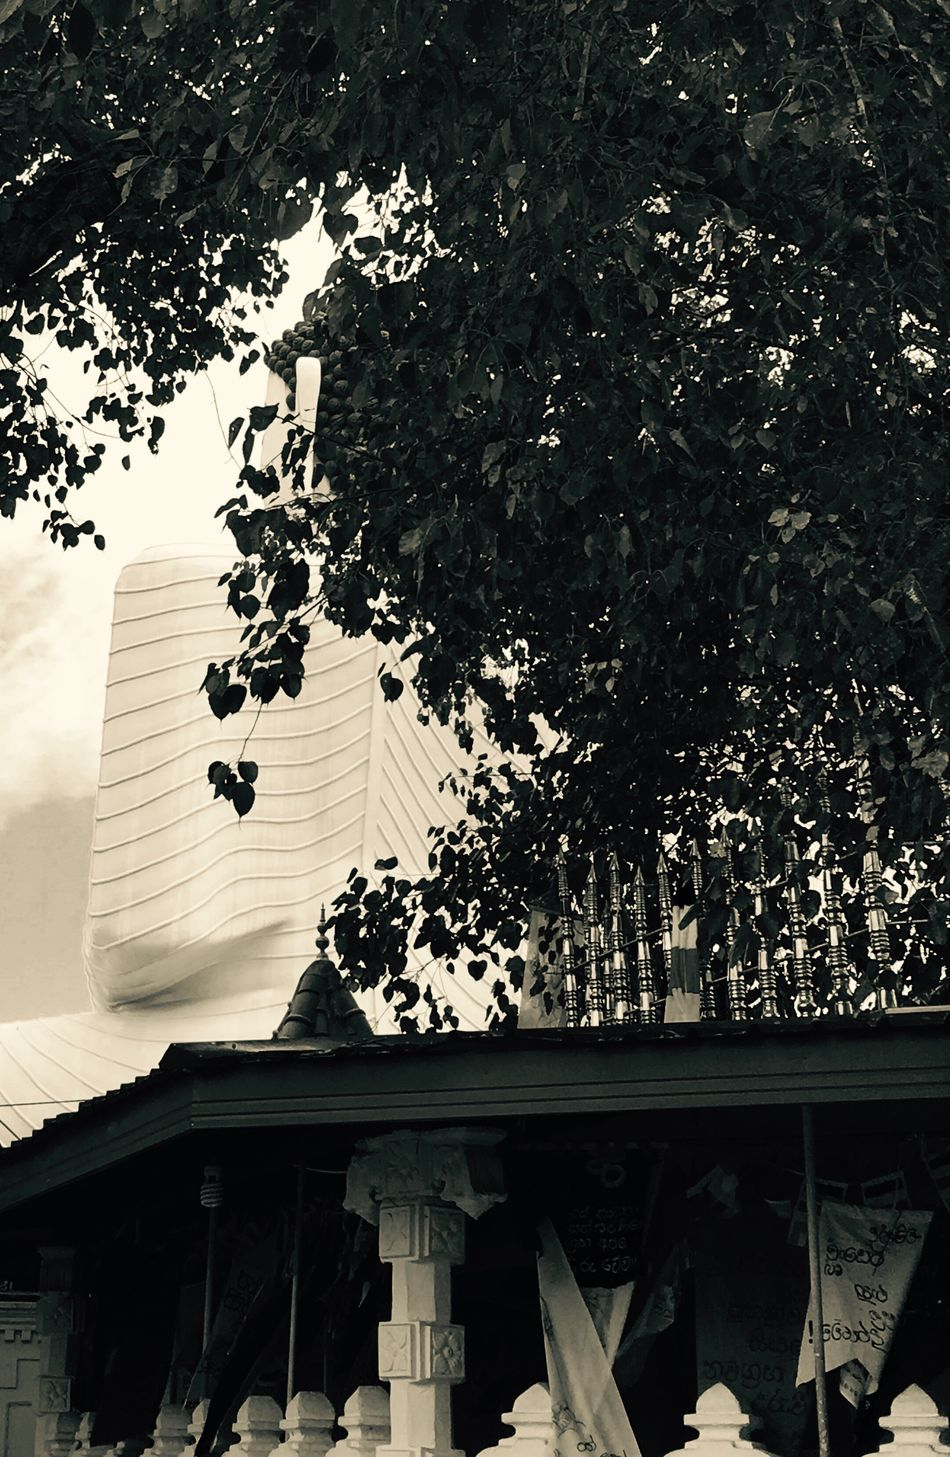 Behind a philosophy Buddha Buddah Statue Sri Lanka Temple Summer Outdoors First Eyeem Photo